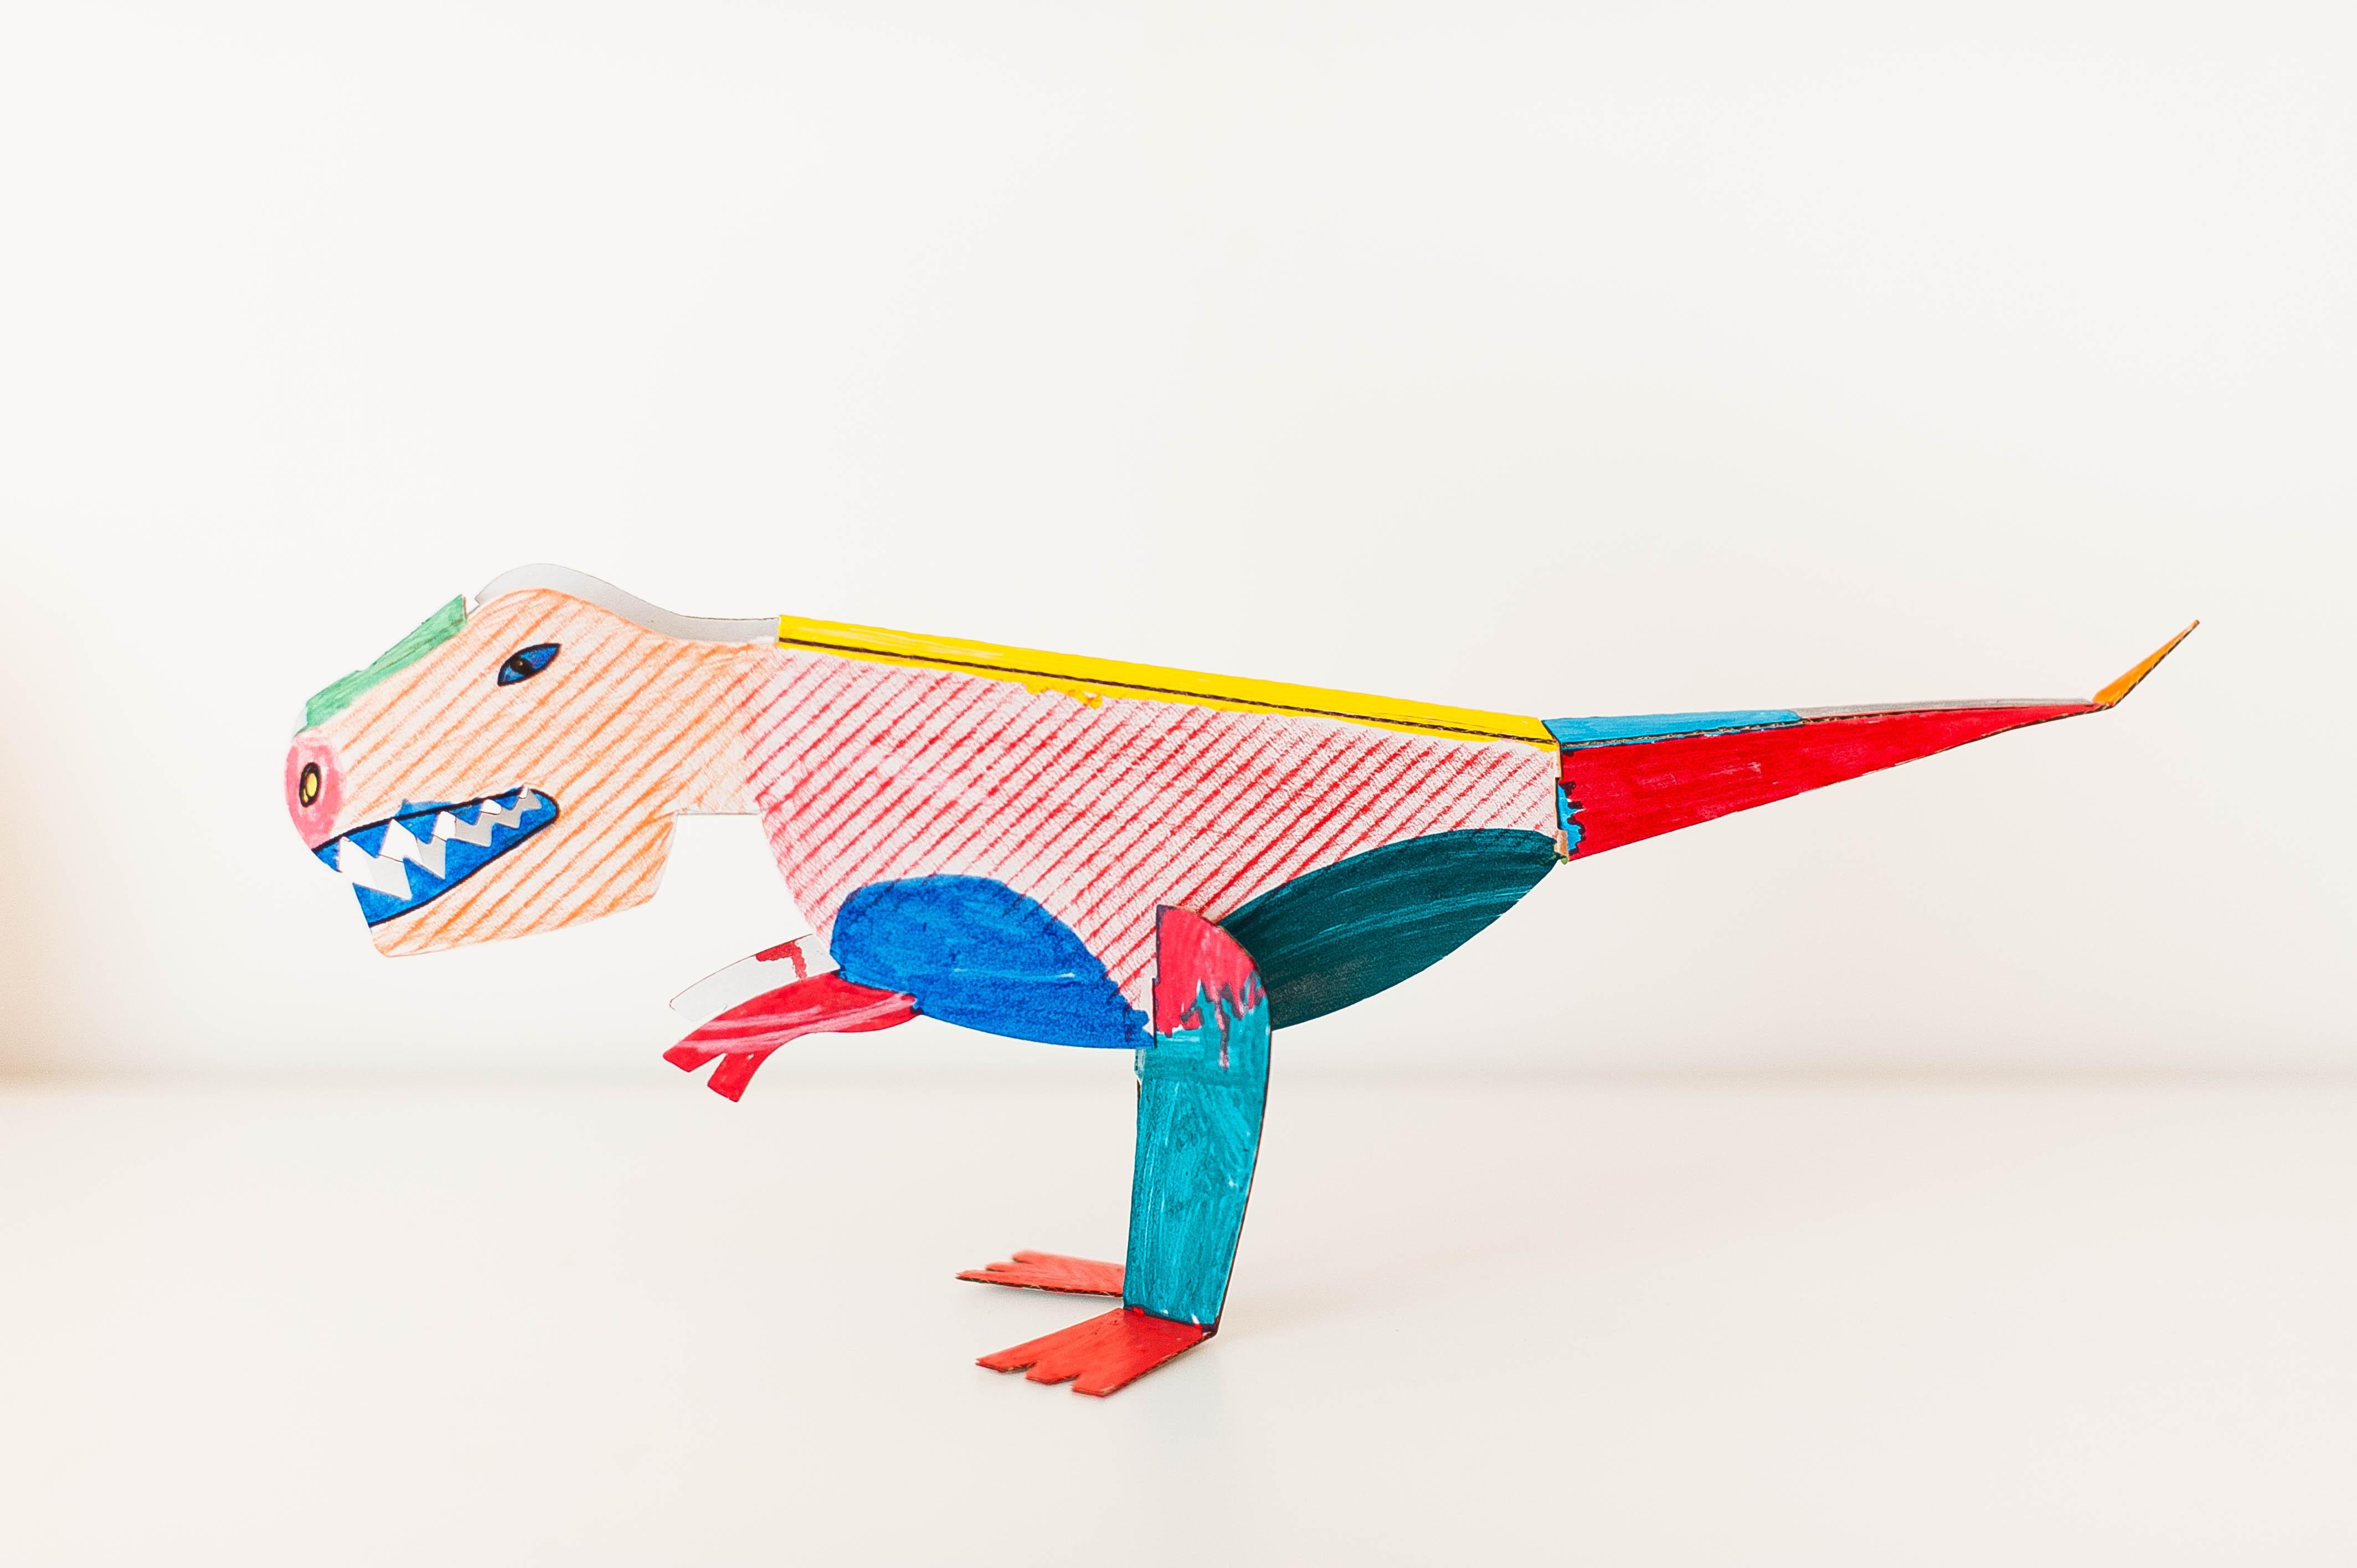 Les dinodulos de Mitik